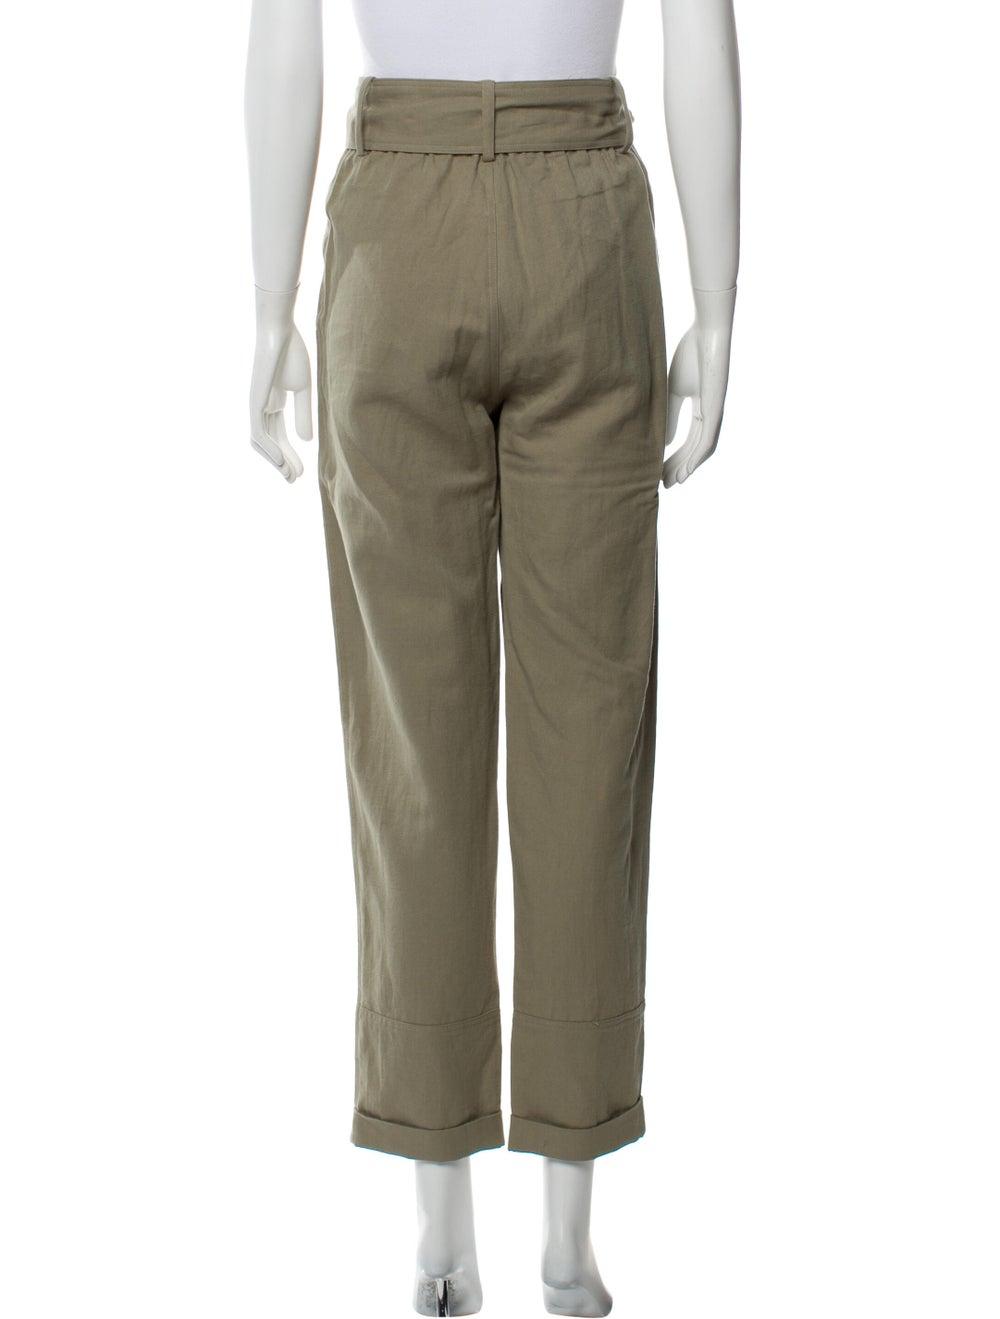 Apiece Apart Linen Straight Leg Pants Green - image 3